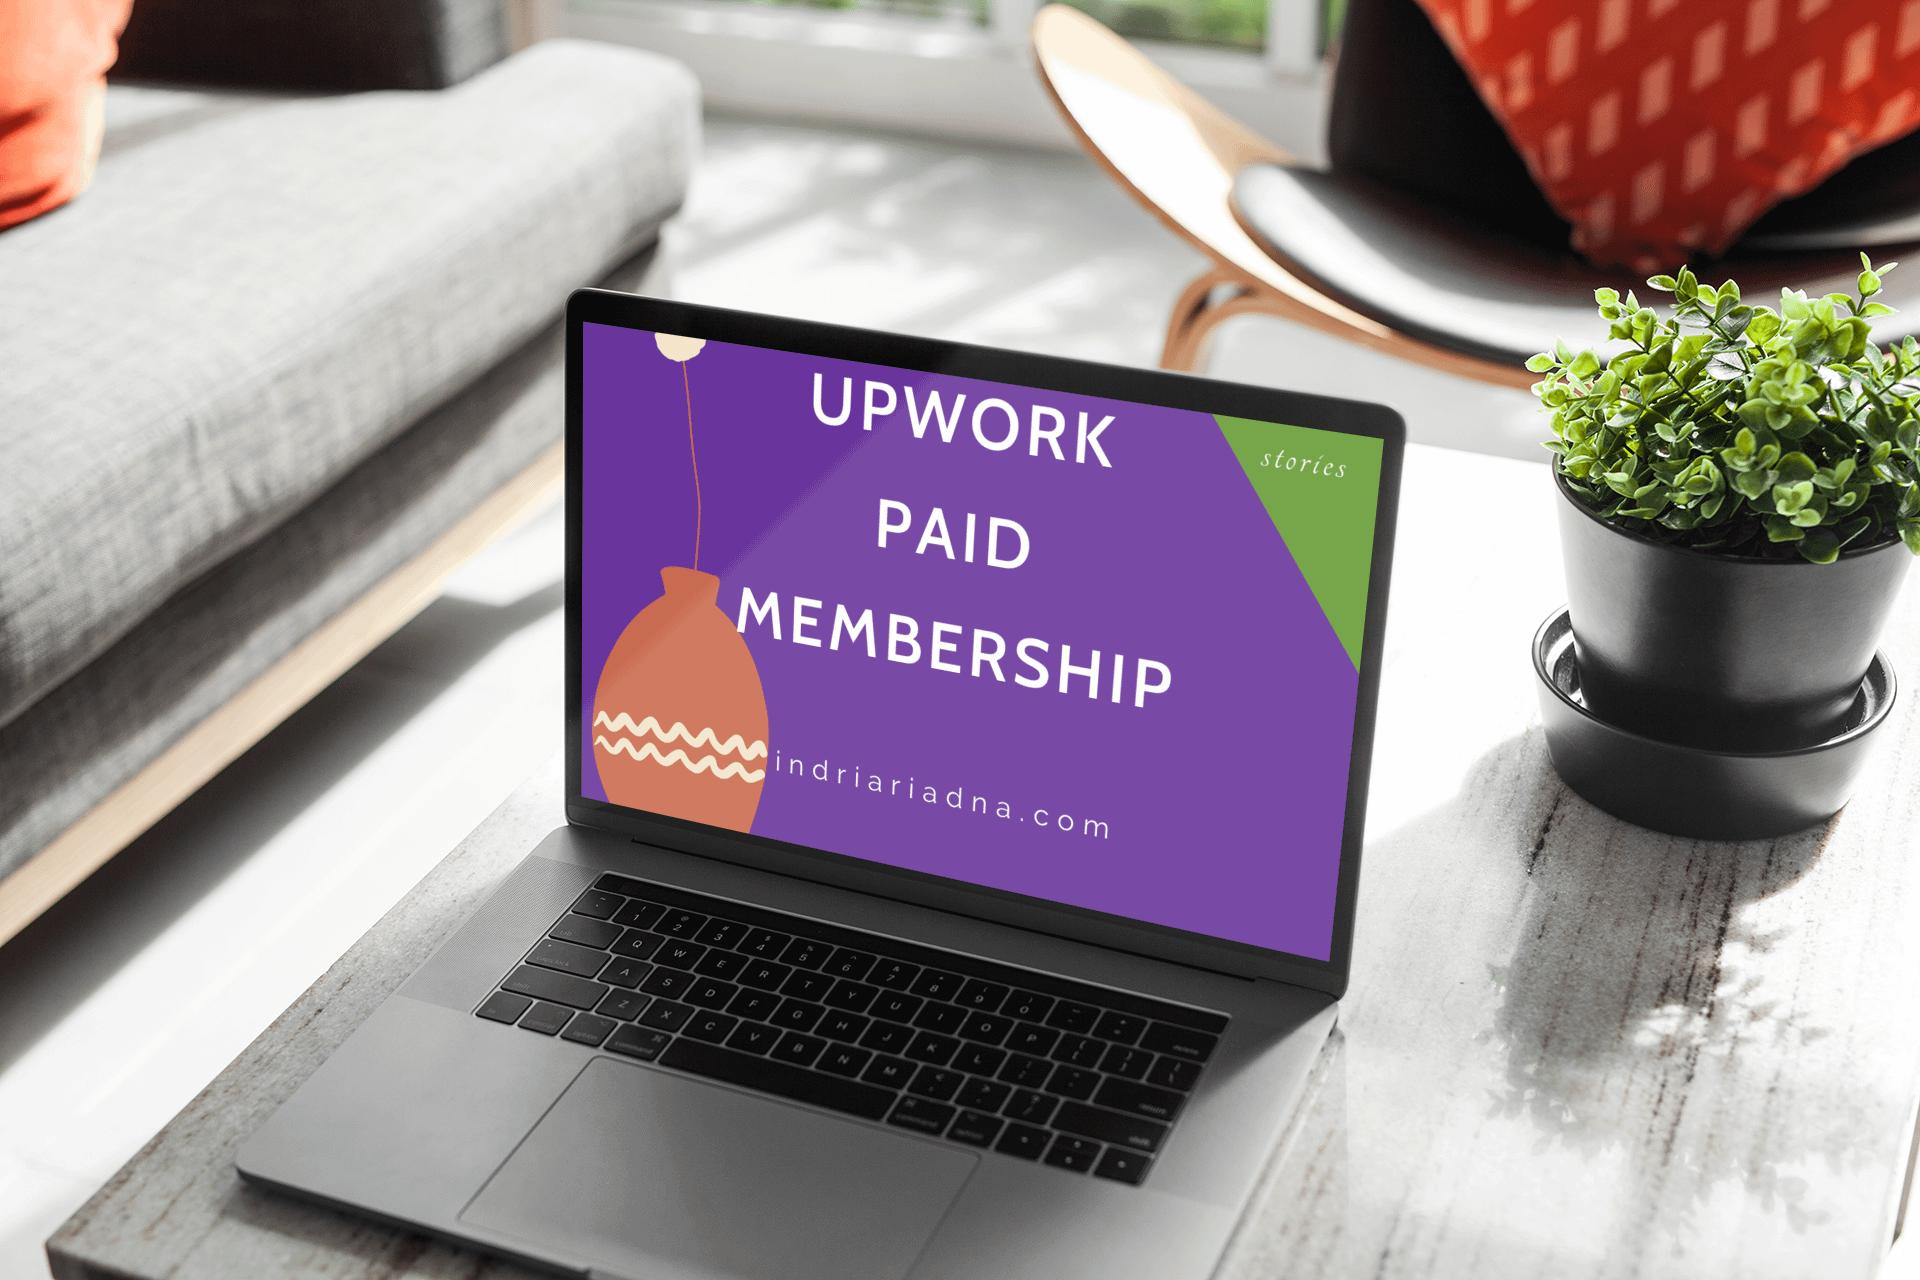 upwork paid membership